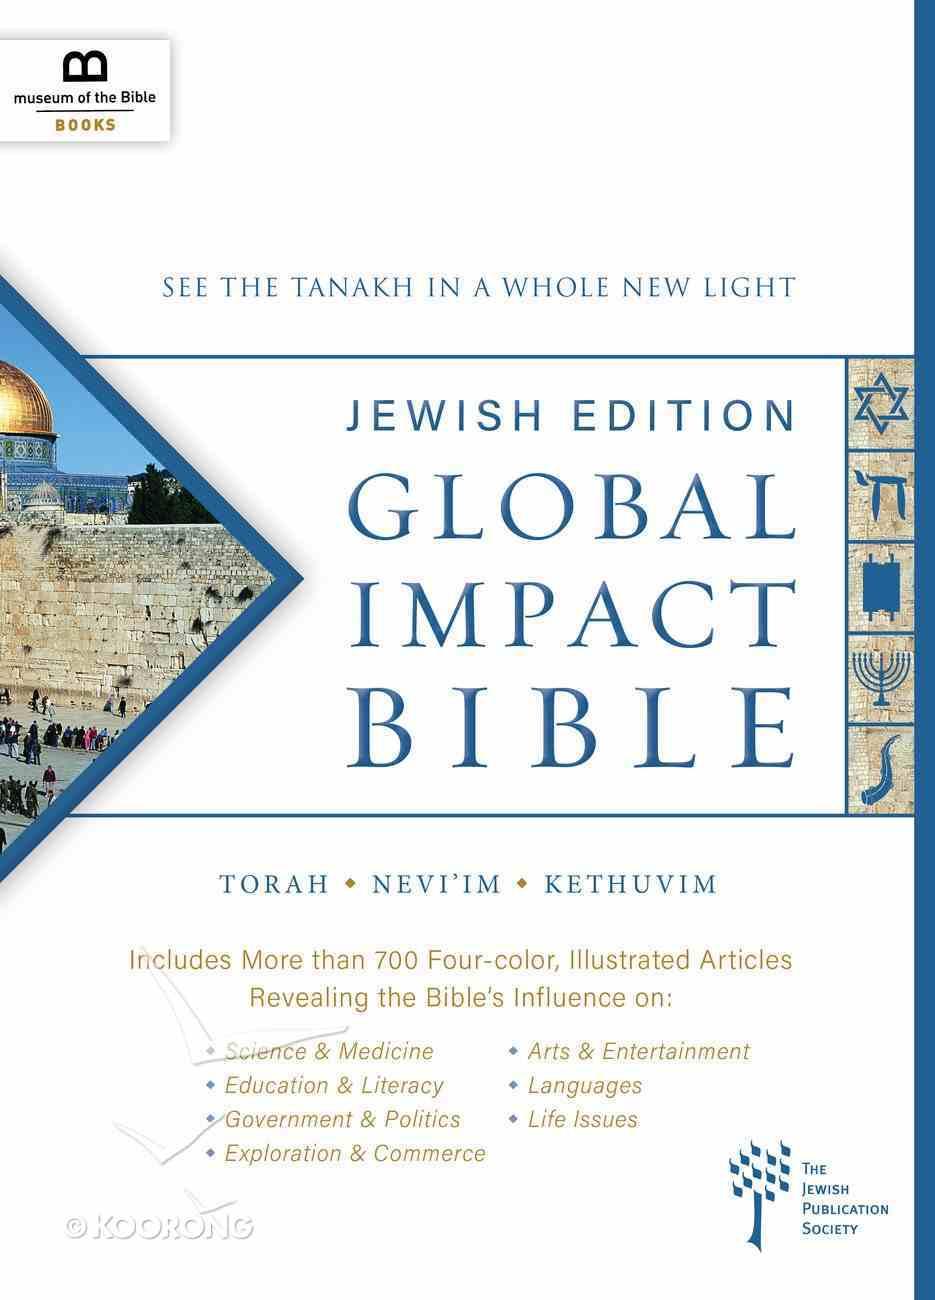 Global Impact Bible Jewish Edition Hardback